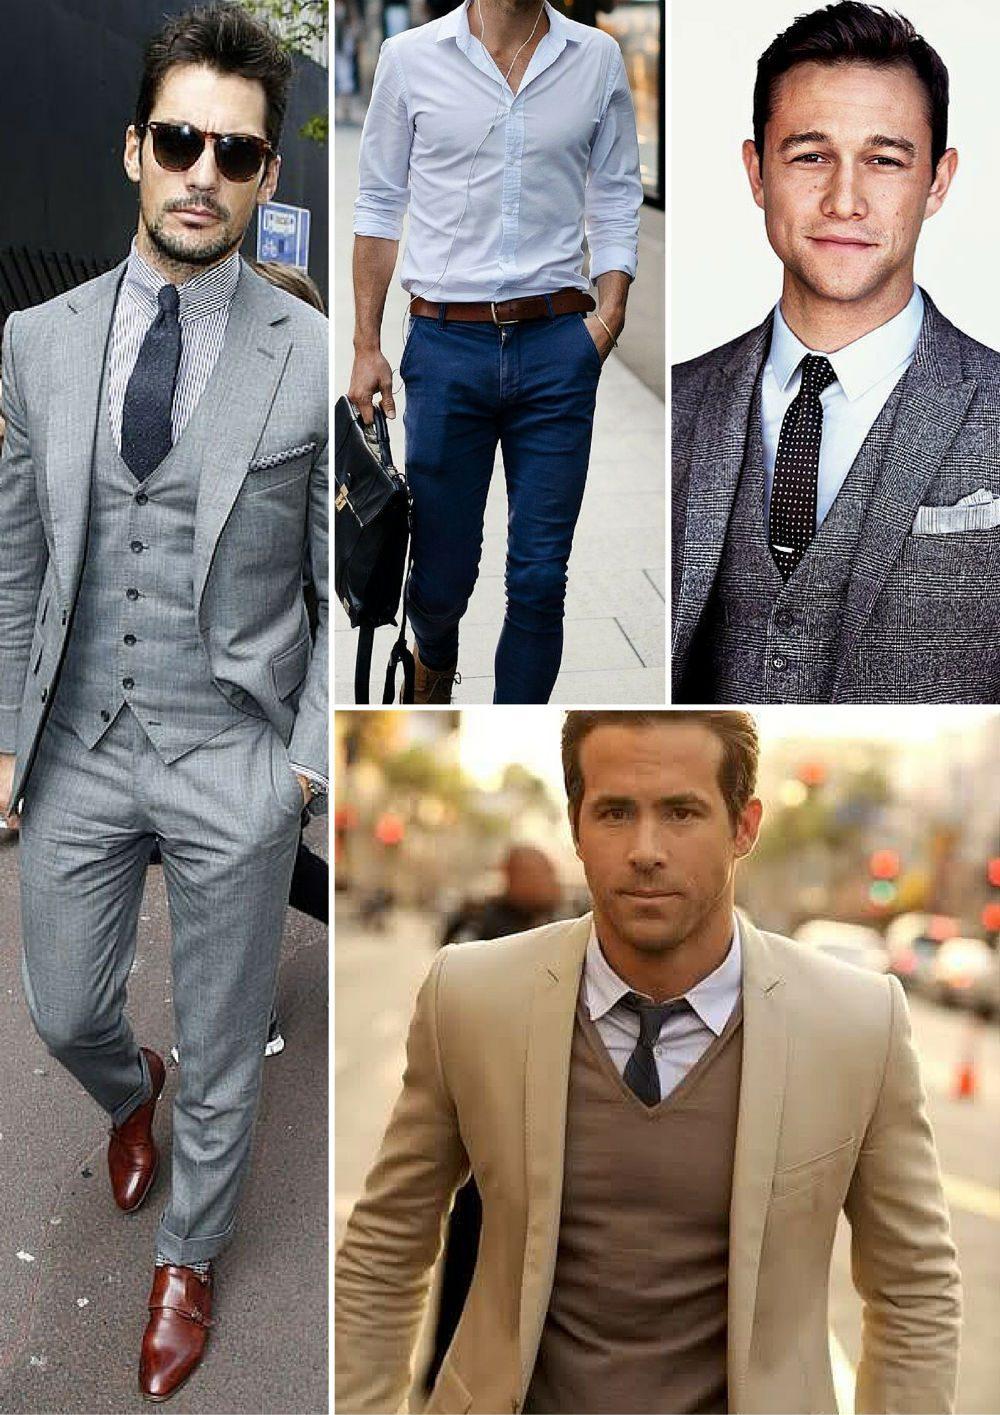 olika typer av skjortor dressad kostymskjorta